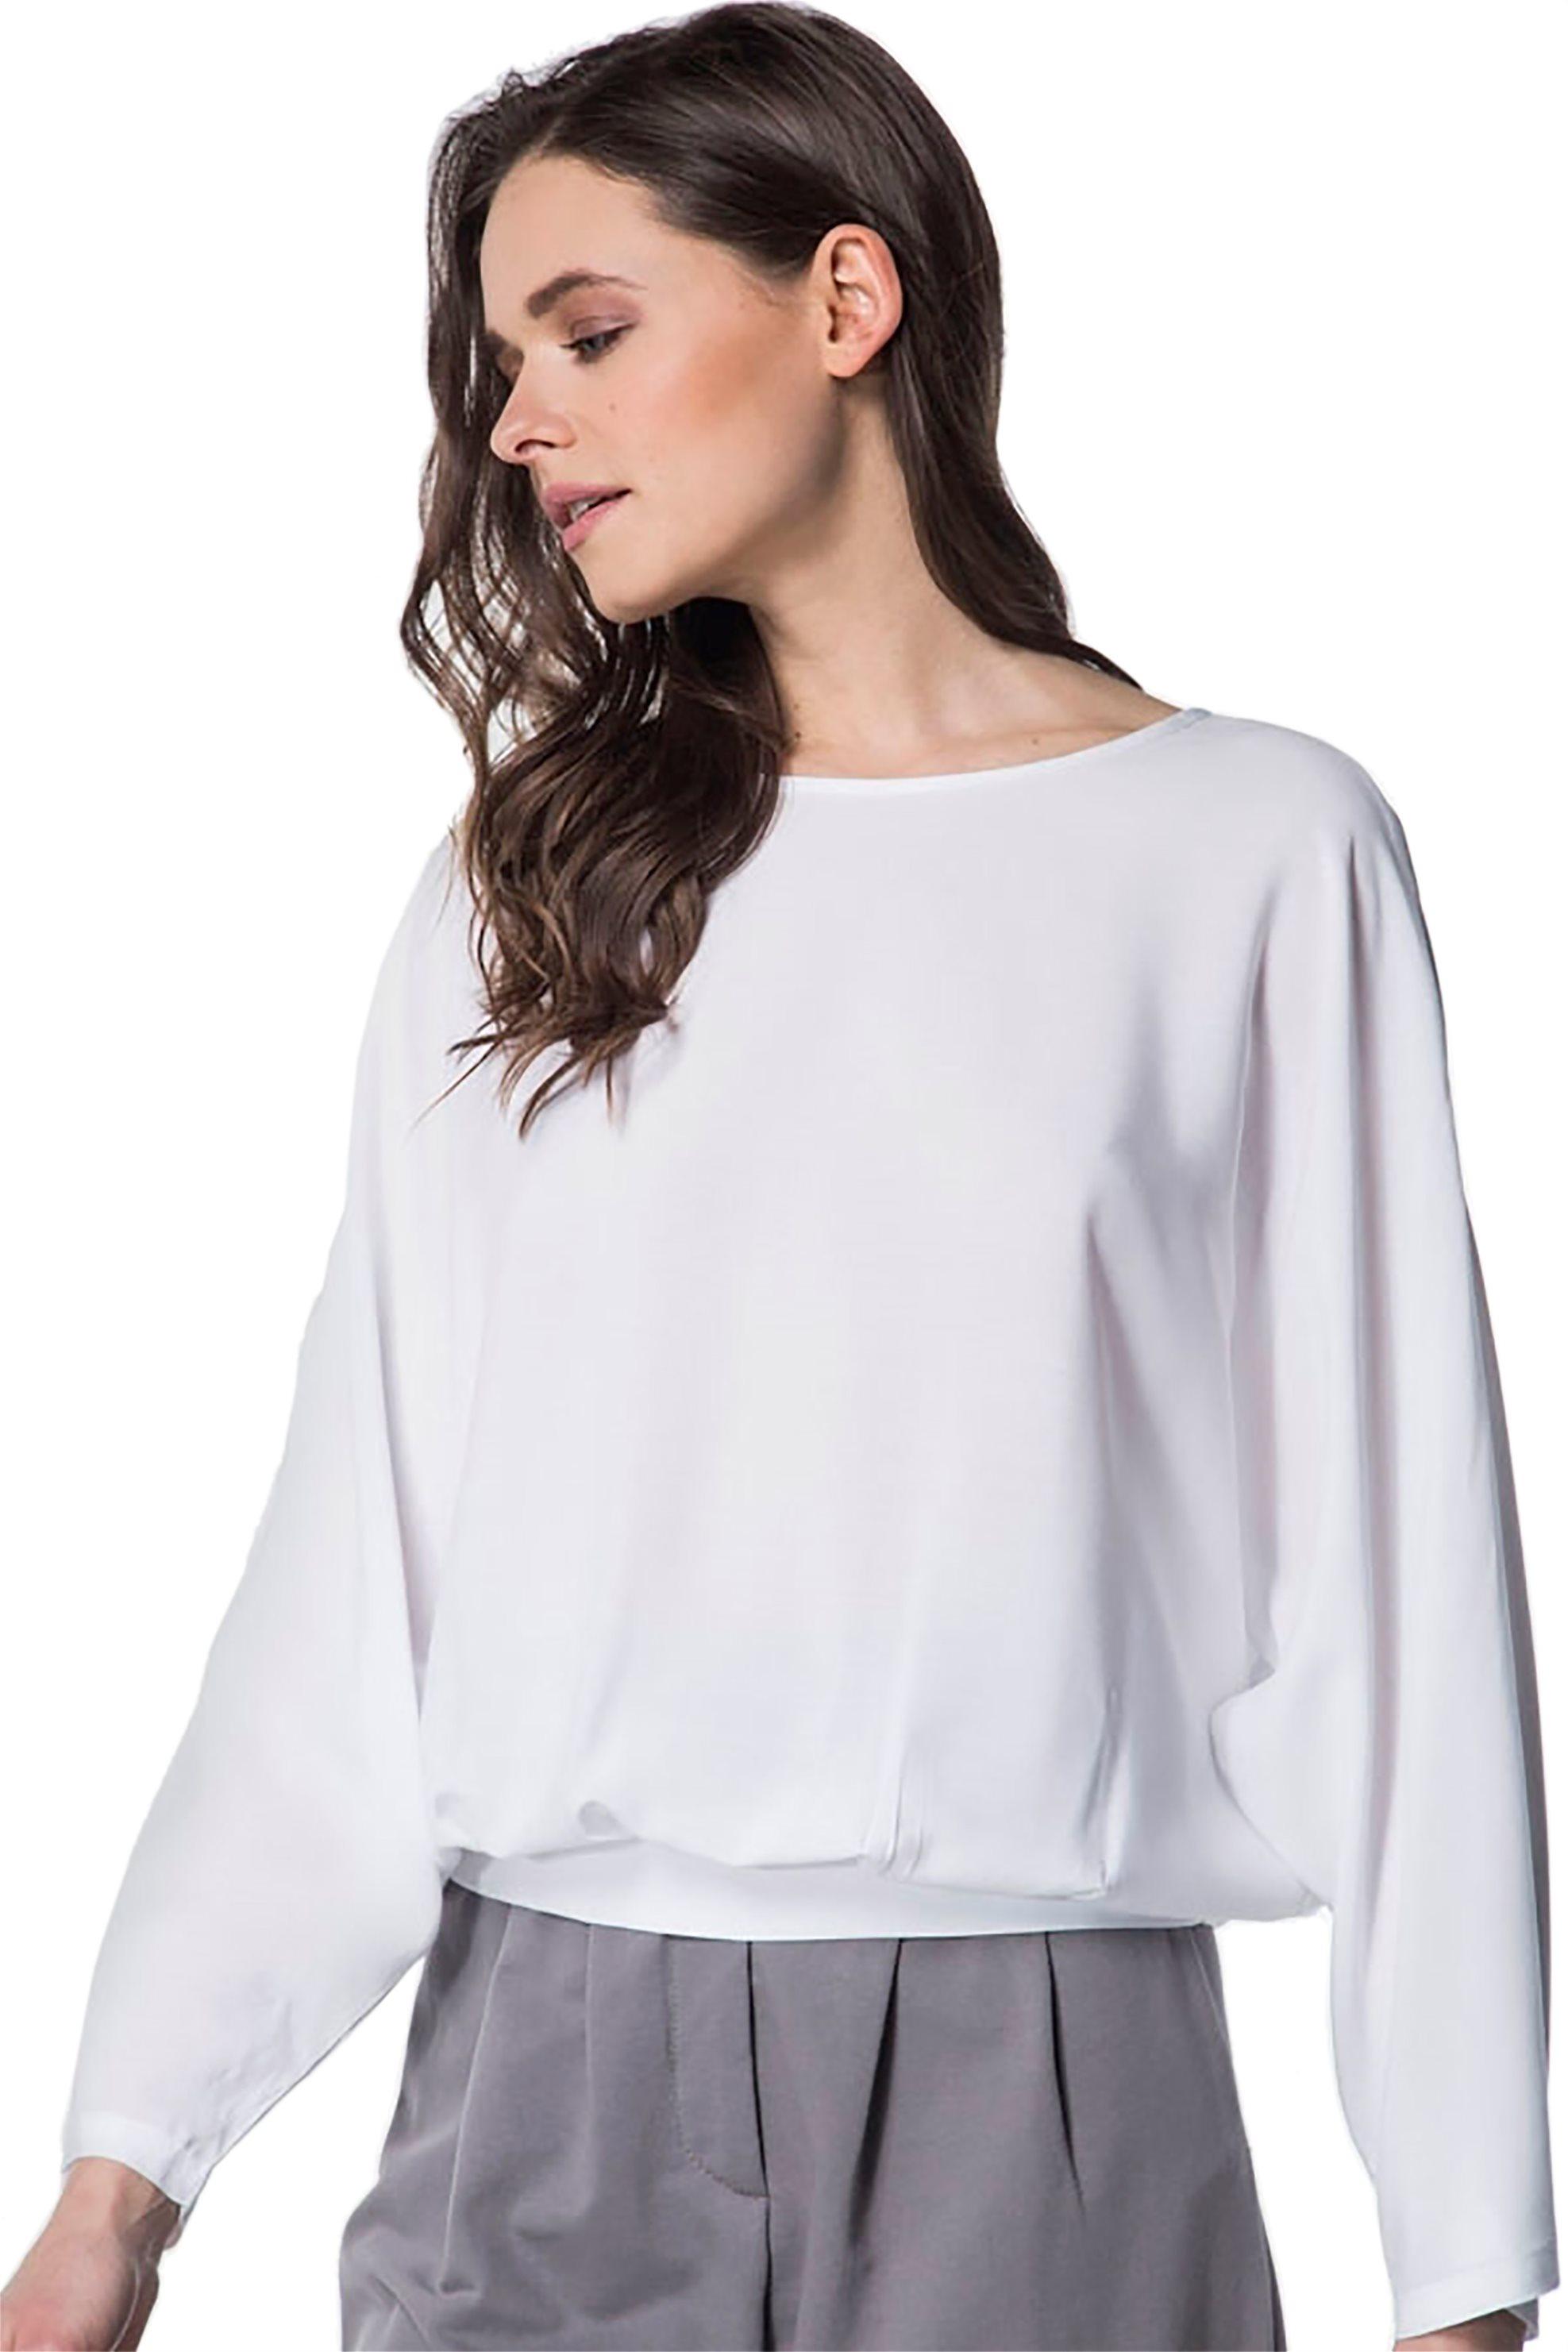 279ffa142818 GoldenShopping.gr - Γυναικεία   Ρούχα   Μπλούζες   Βραδινές